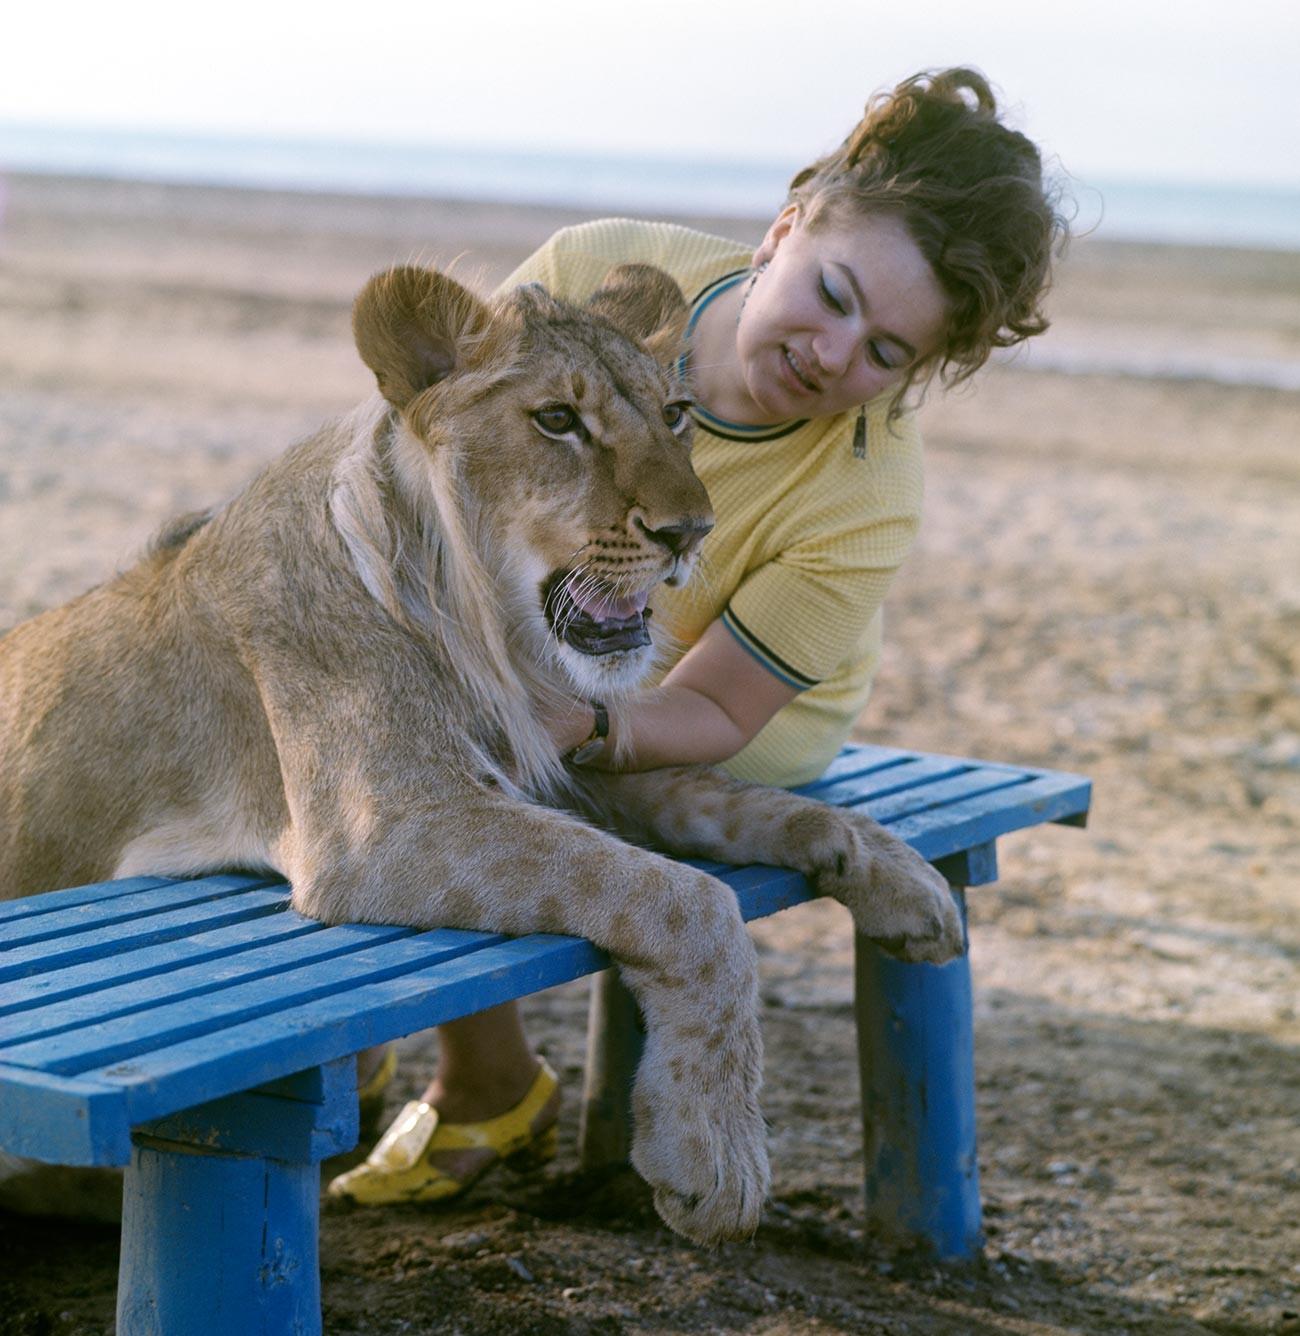 Nina Berberova on a walk with her pet lion King. The coast of the Caspian Sea